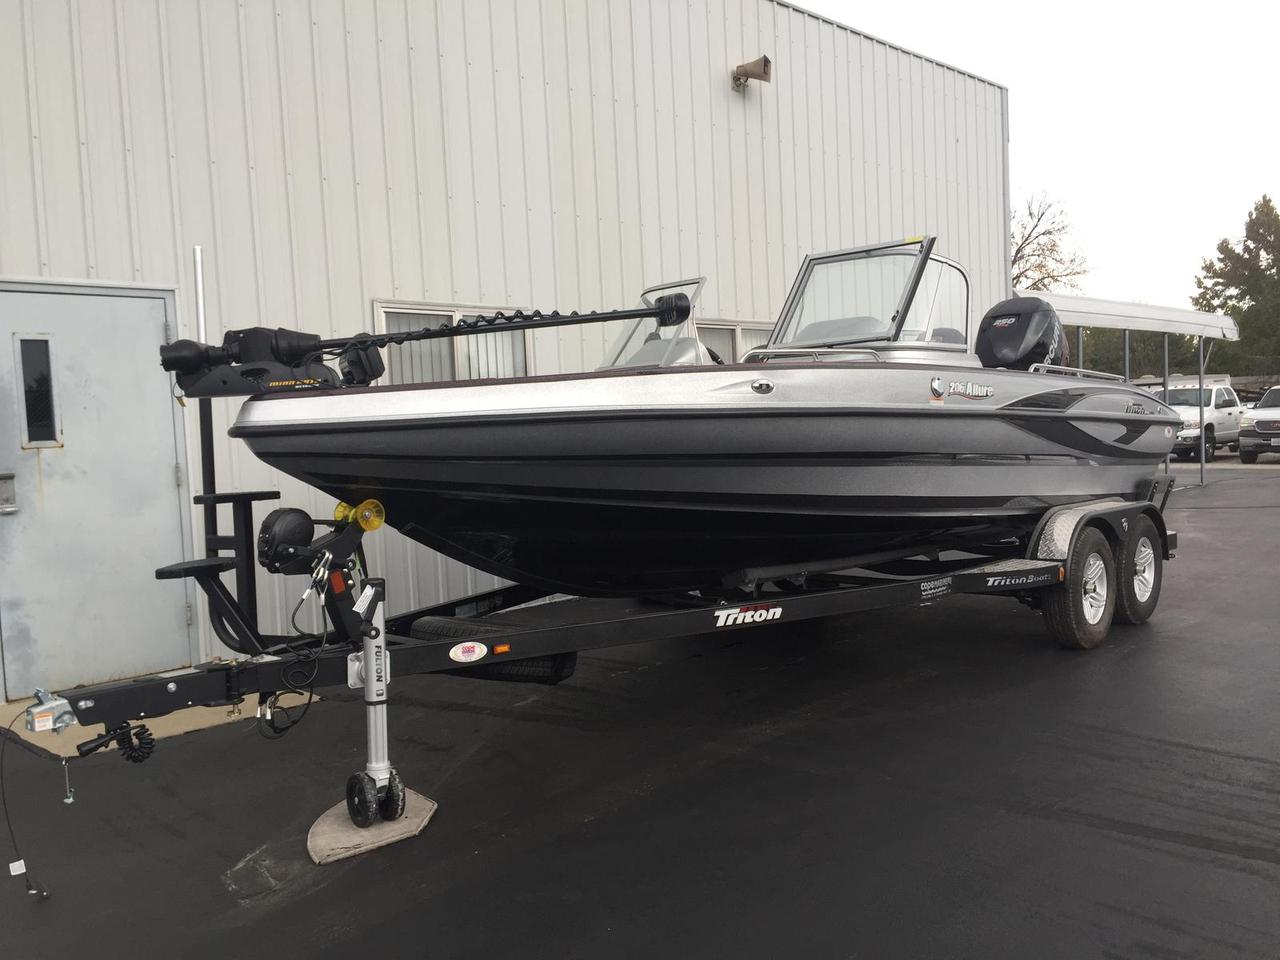 2017 new triton boats 206 allure ski and fish boat for for Fish and ski boats for sale